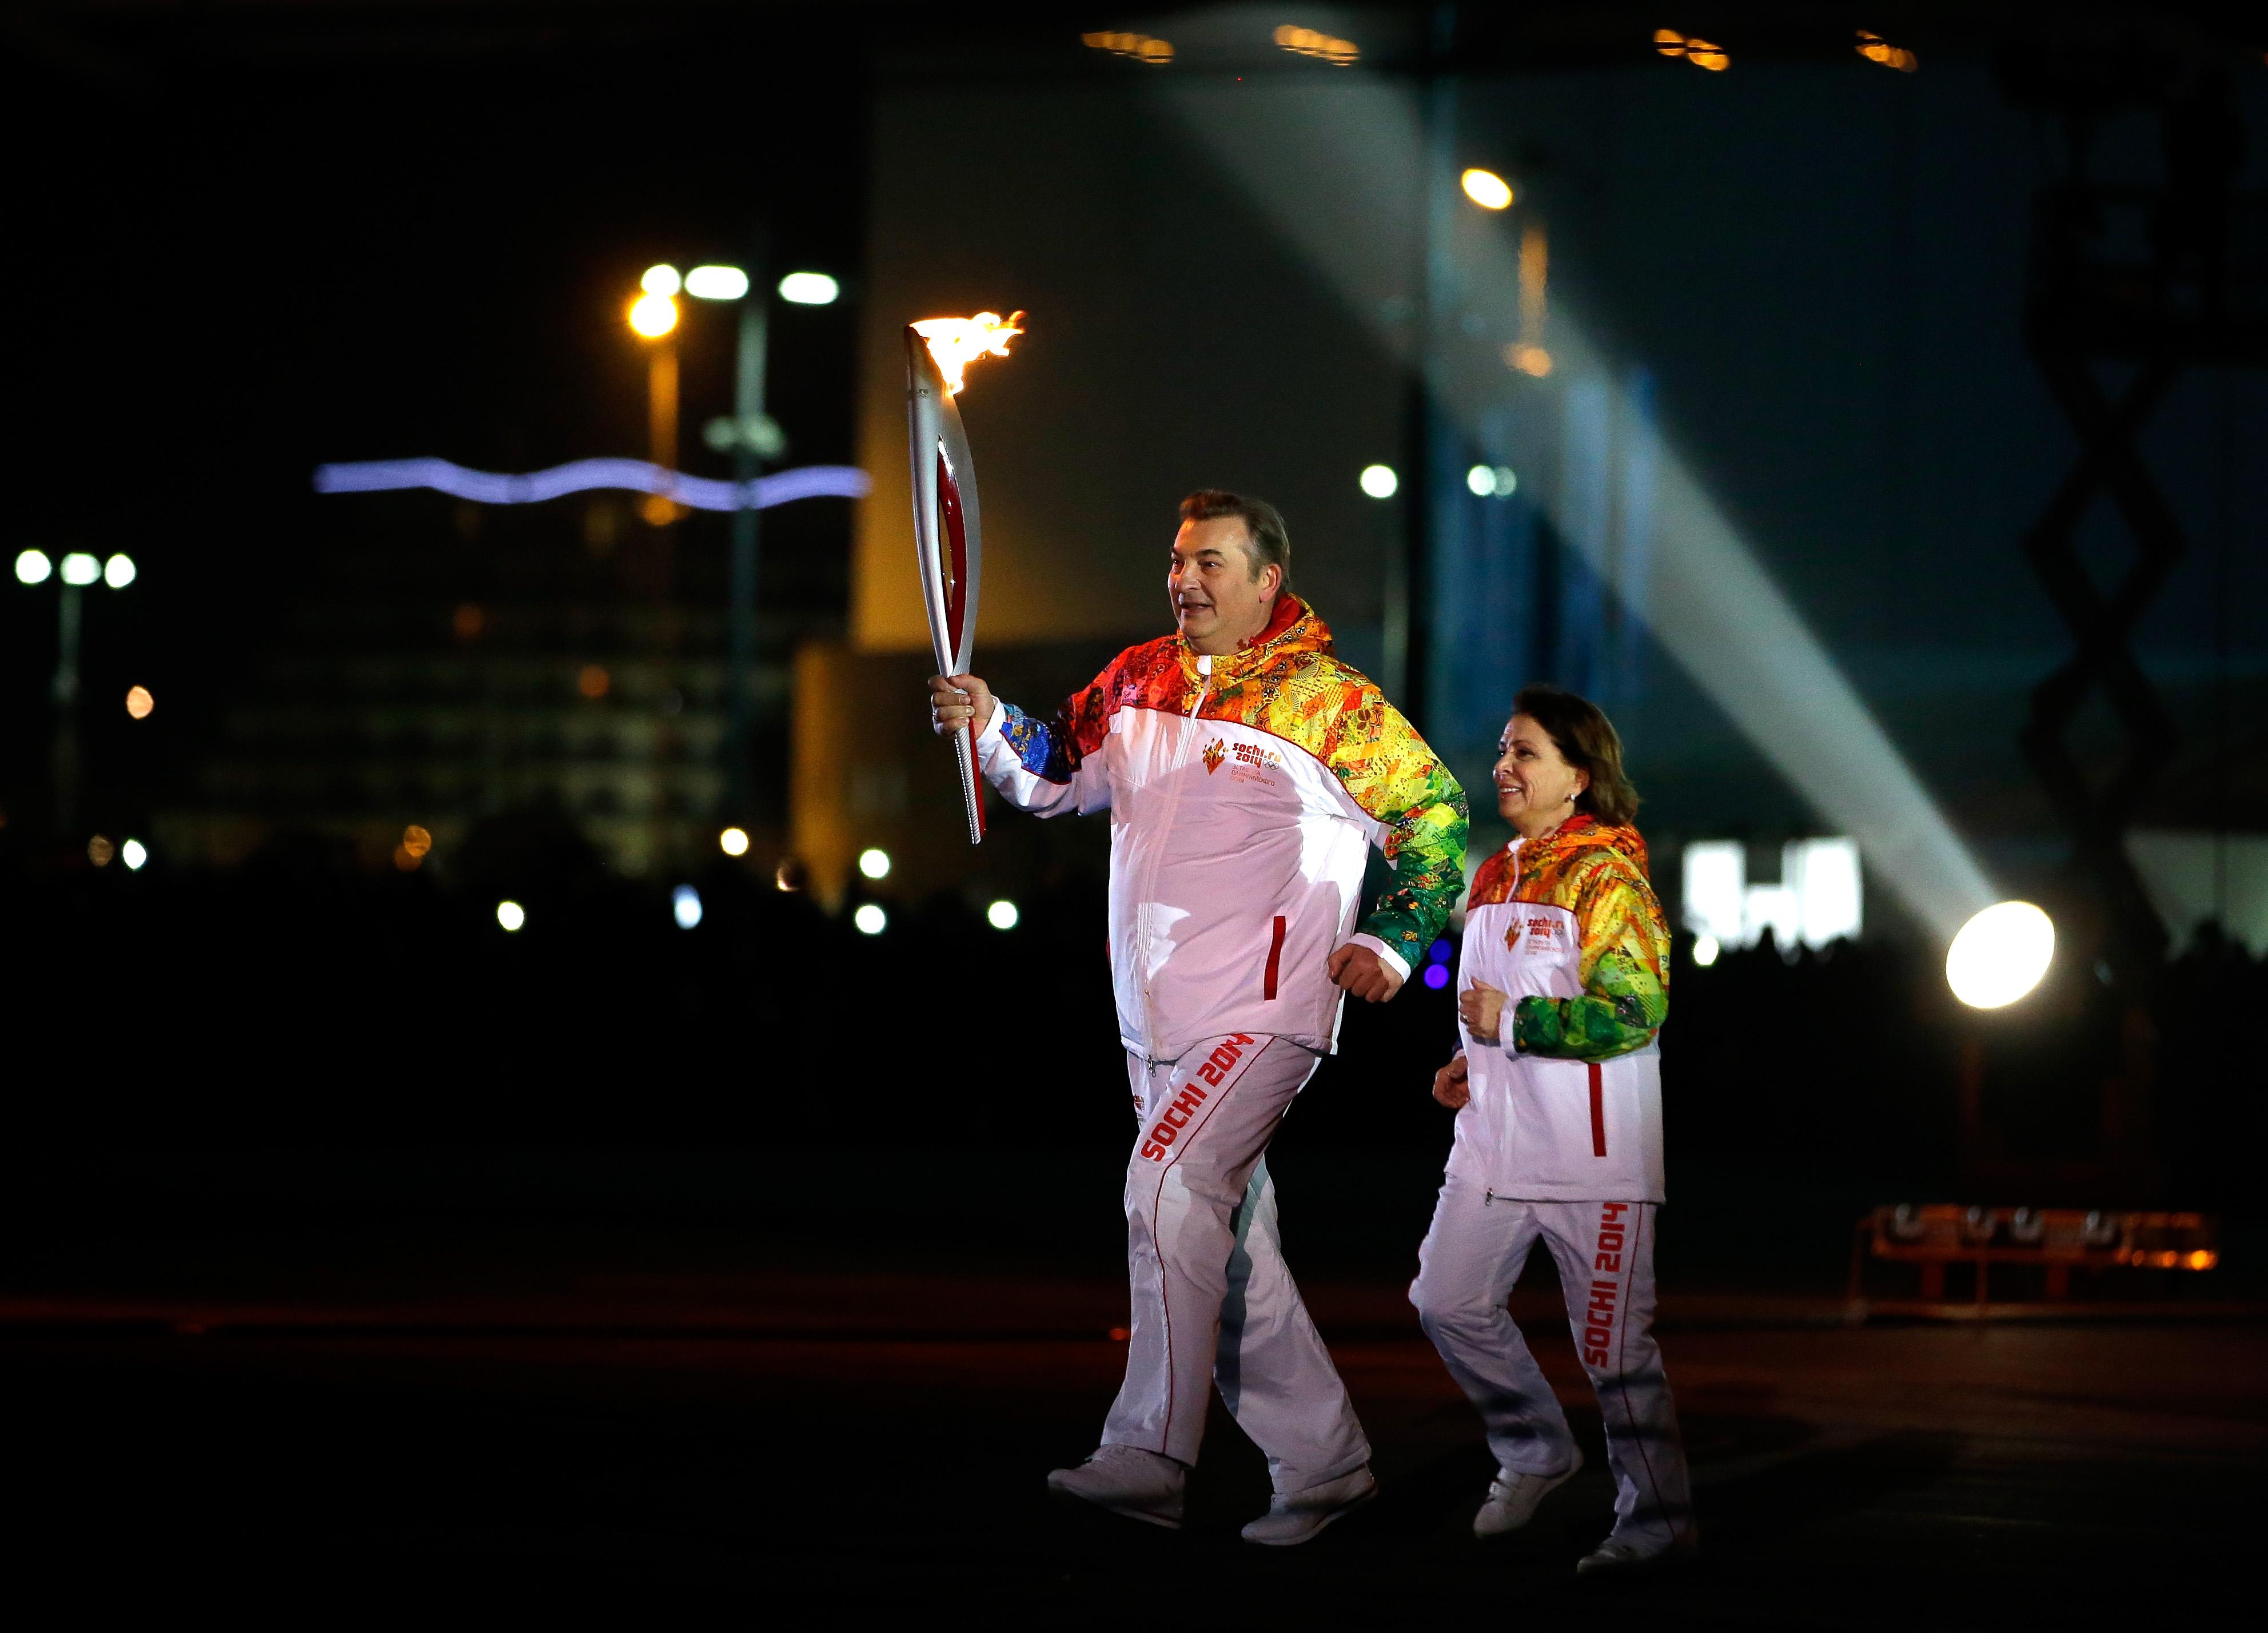 Irina Rodnina and Vladislav Tretyak lit the Olympic flame in Sochi 42